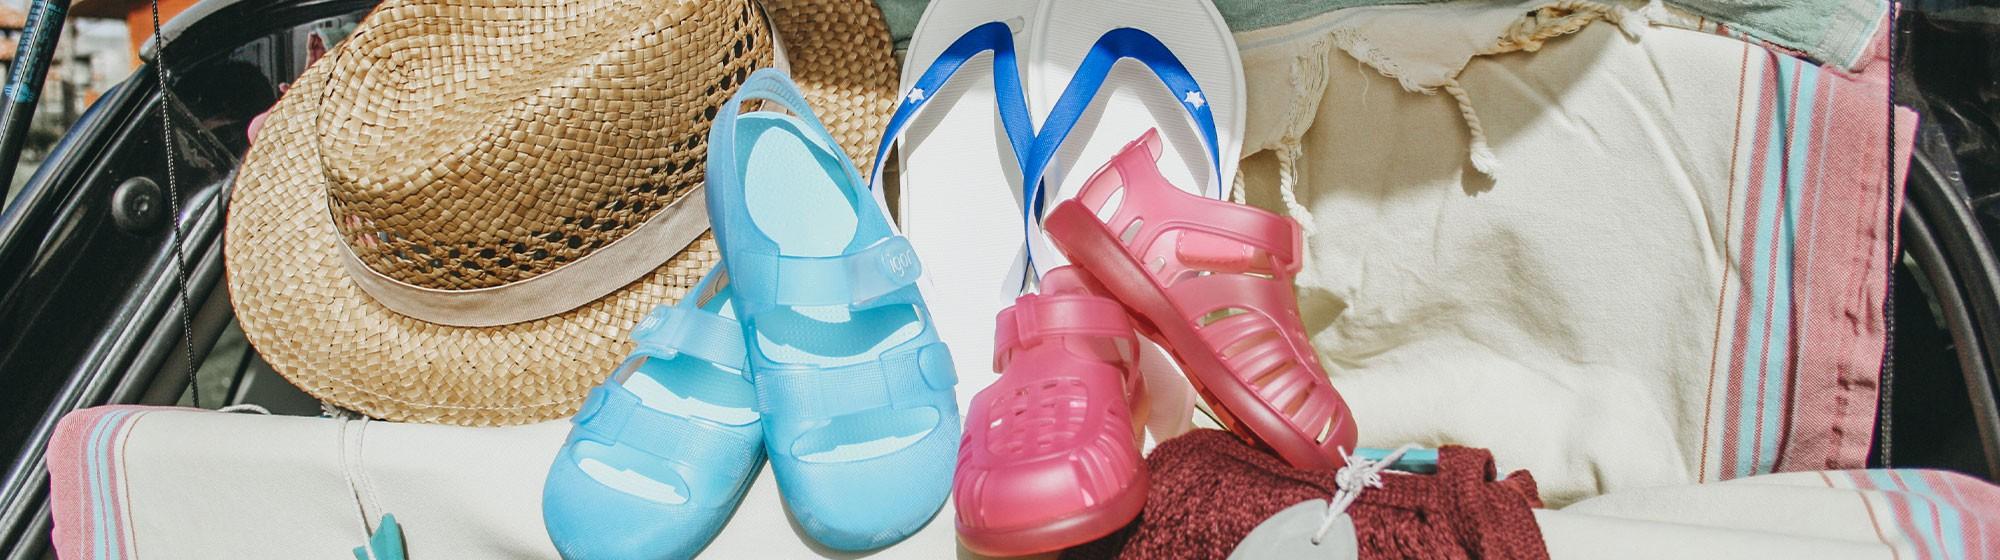 Jelly Sandals and Beachwear